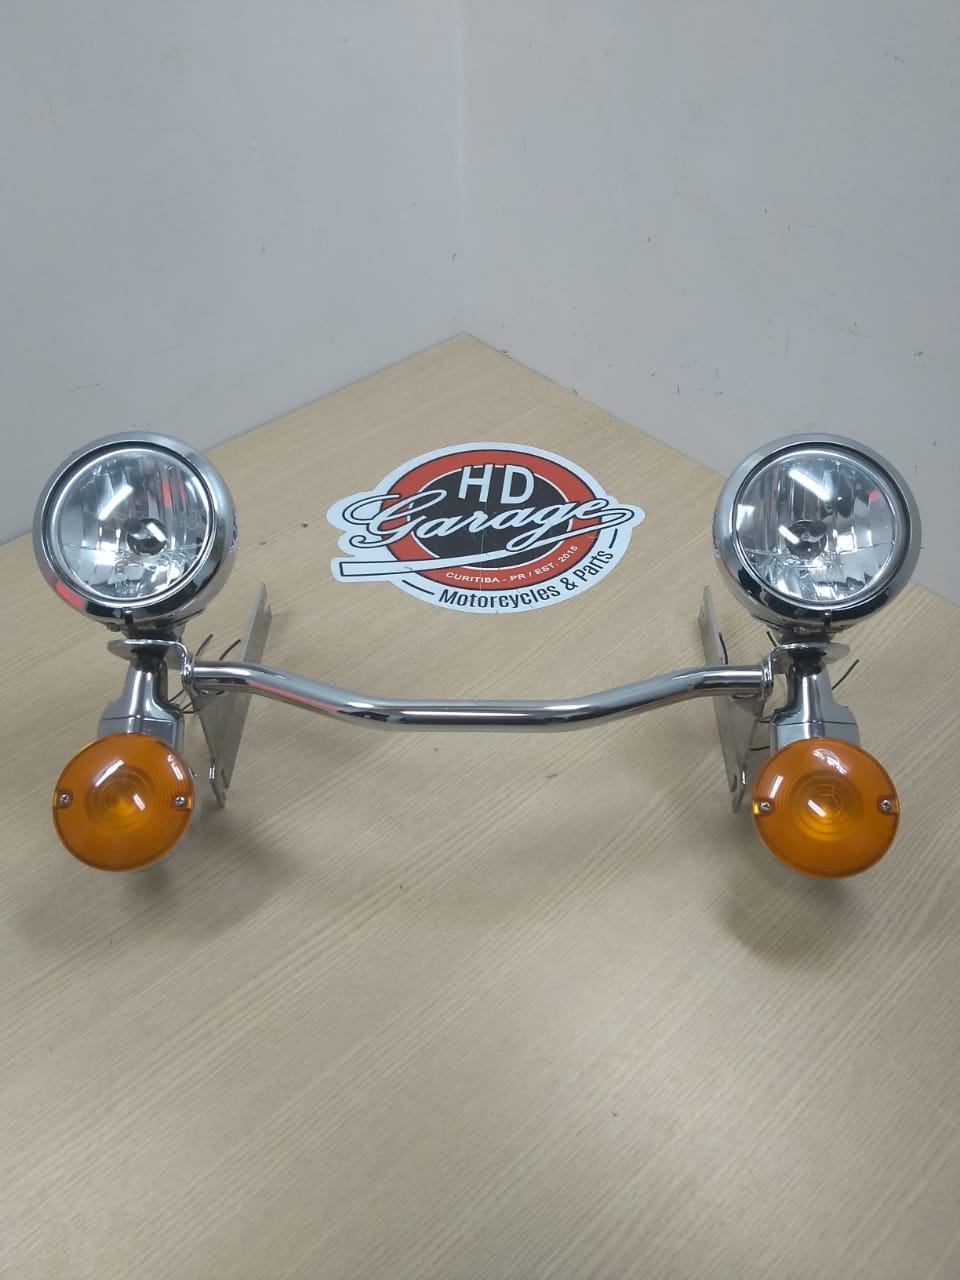 Faróis Auxiliares Cromados Genuinos - HD Touring Road King - Par - 001/34403